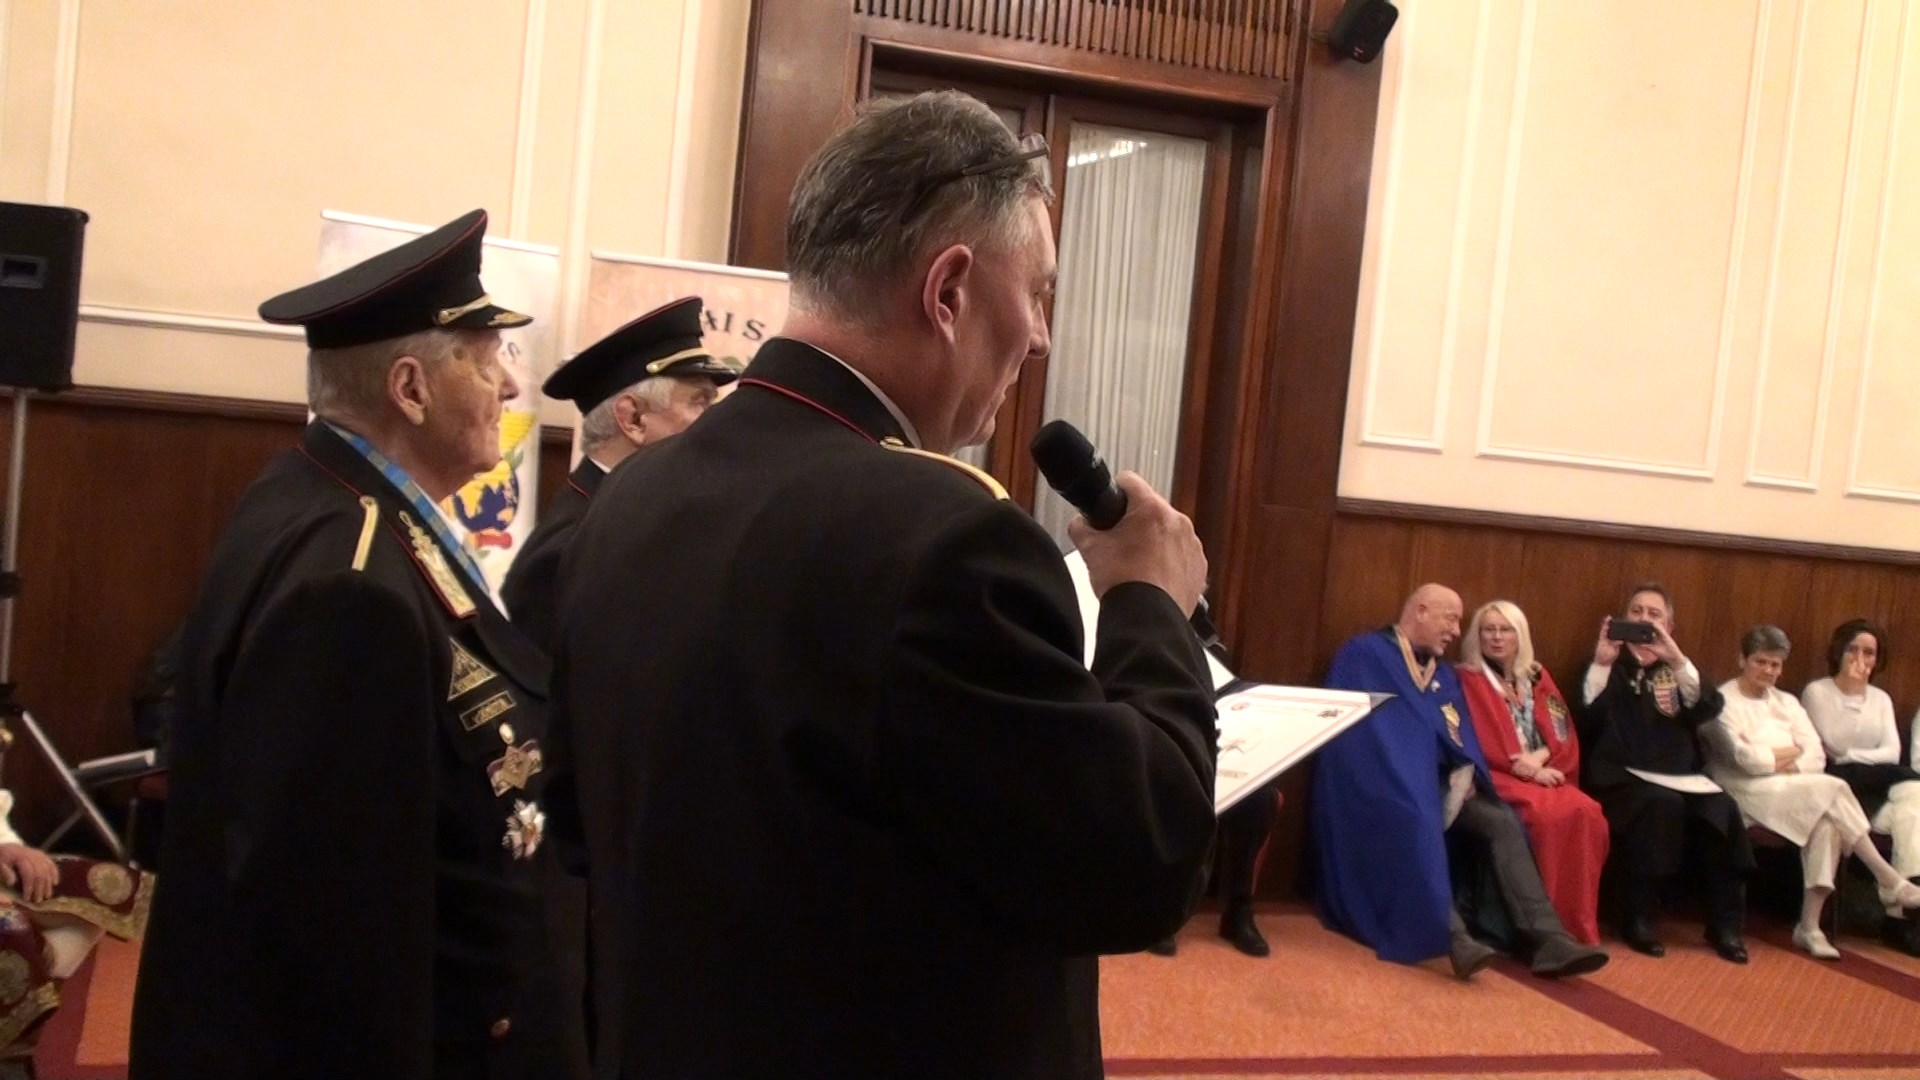 1 prof. dr. Vladislav Kirilovszky KGC nör. ddtbk praefectus legionis